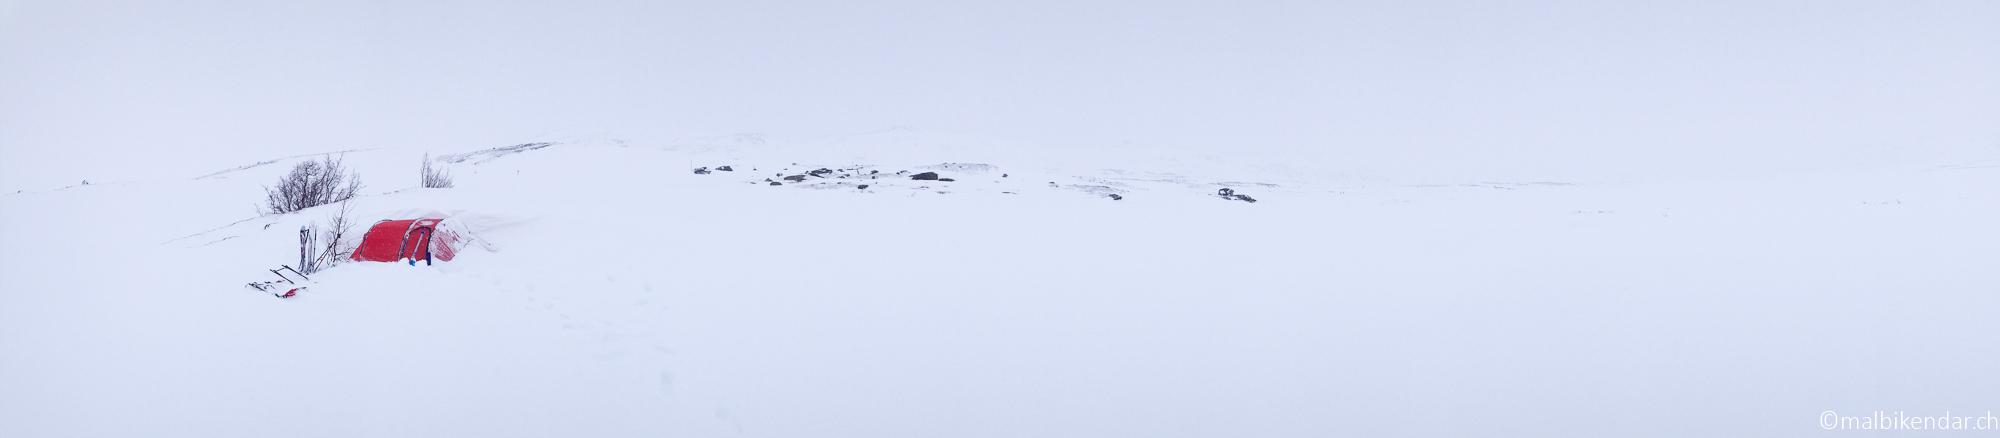 Kungsleden notre Camp de la neige